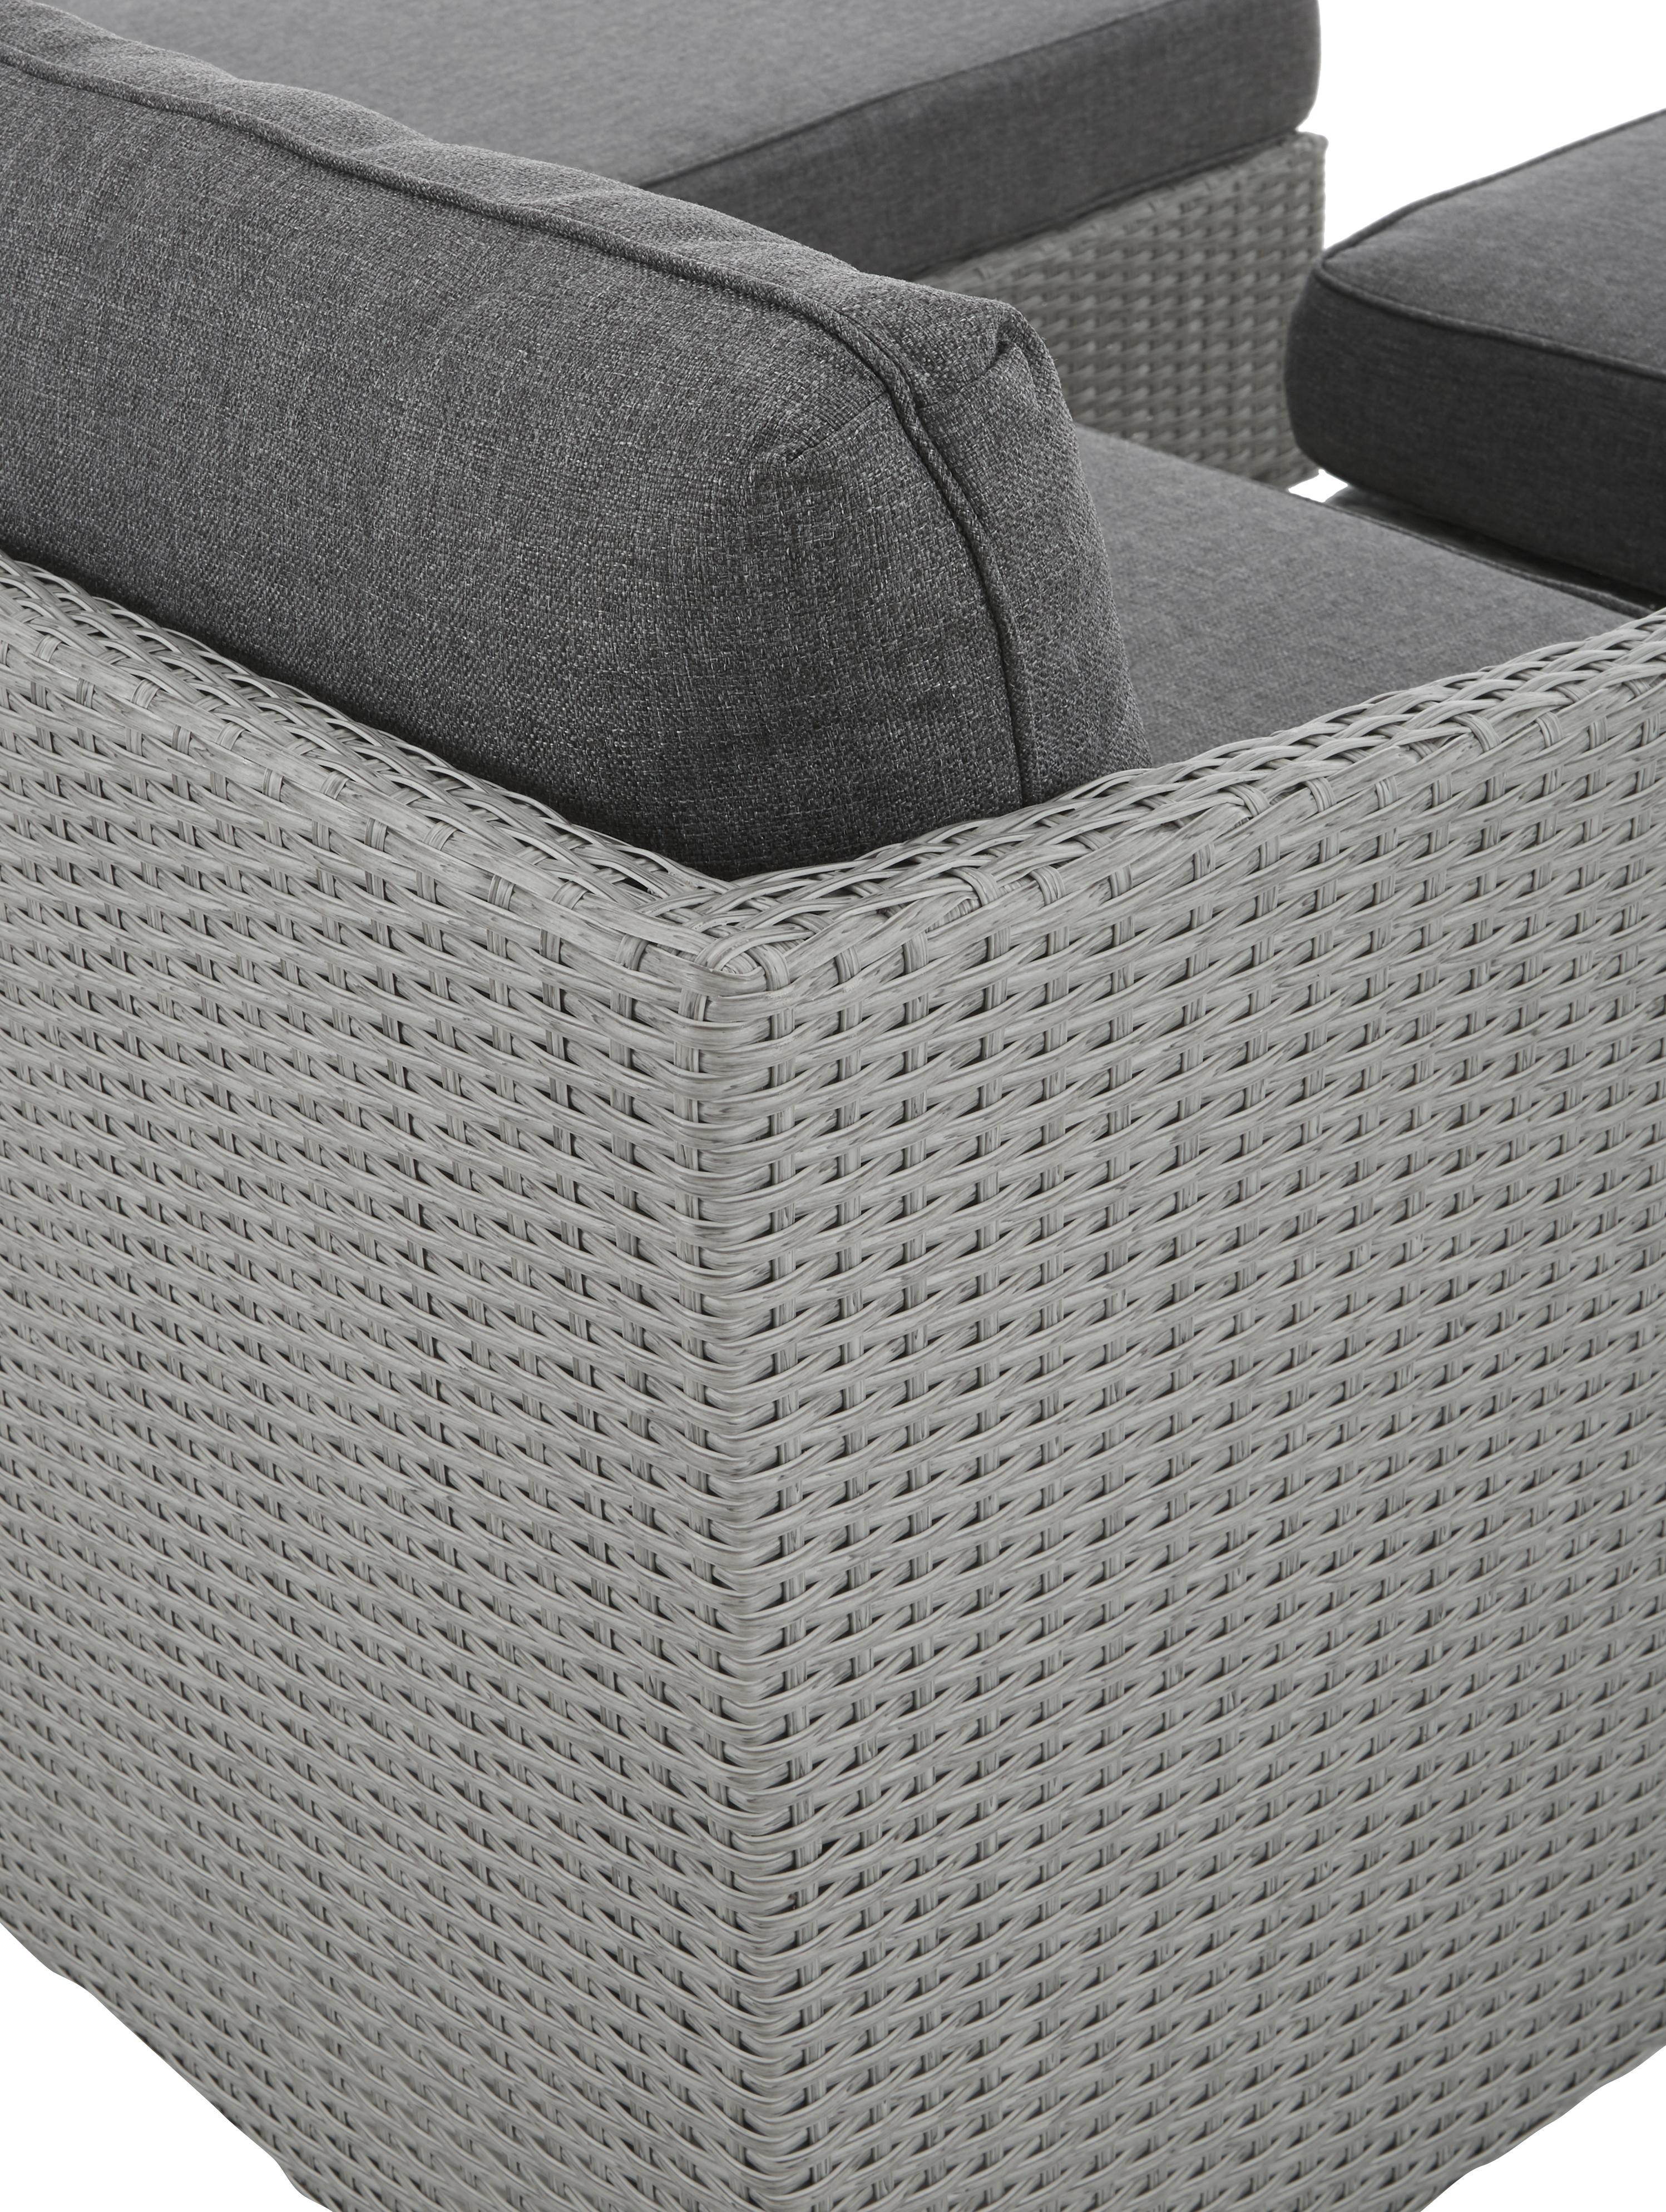 Loungeset Conmay, 3-delig, Frame: aluminium, kunstrotan, Bekleding: Olefin, Tafelblad: glas, Frame: grijs. Bekleding: donkergrijs. Tafelblad: transparant, Set met verschillende formaten